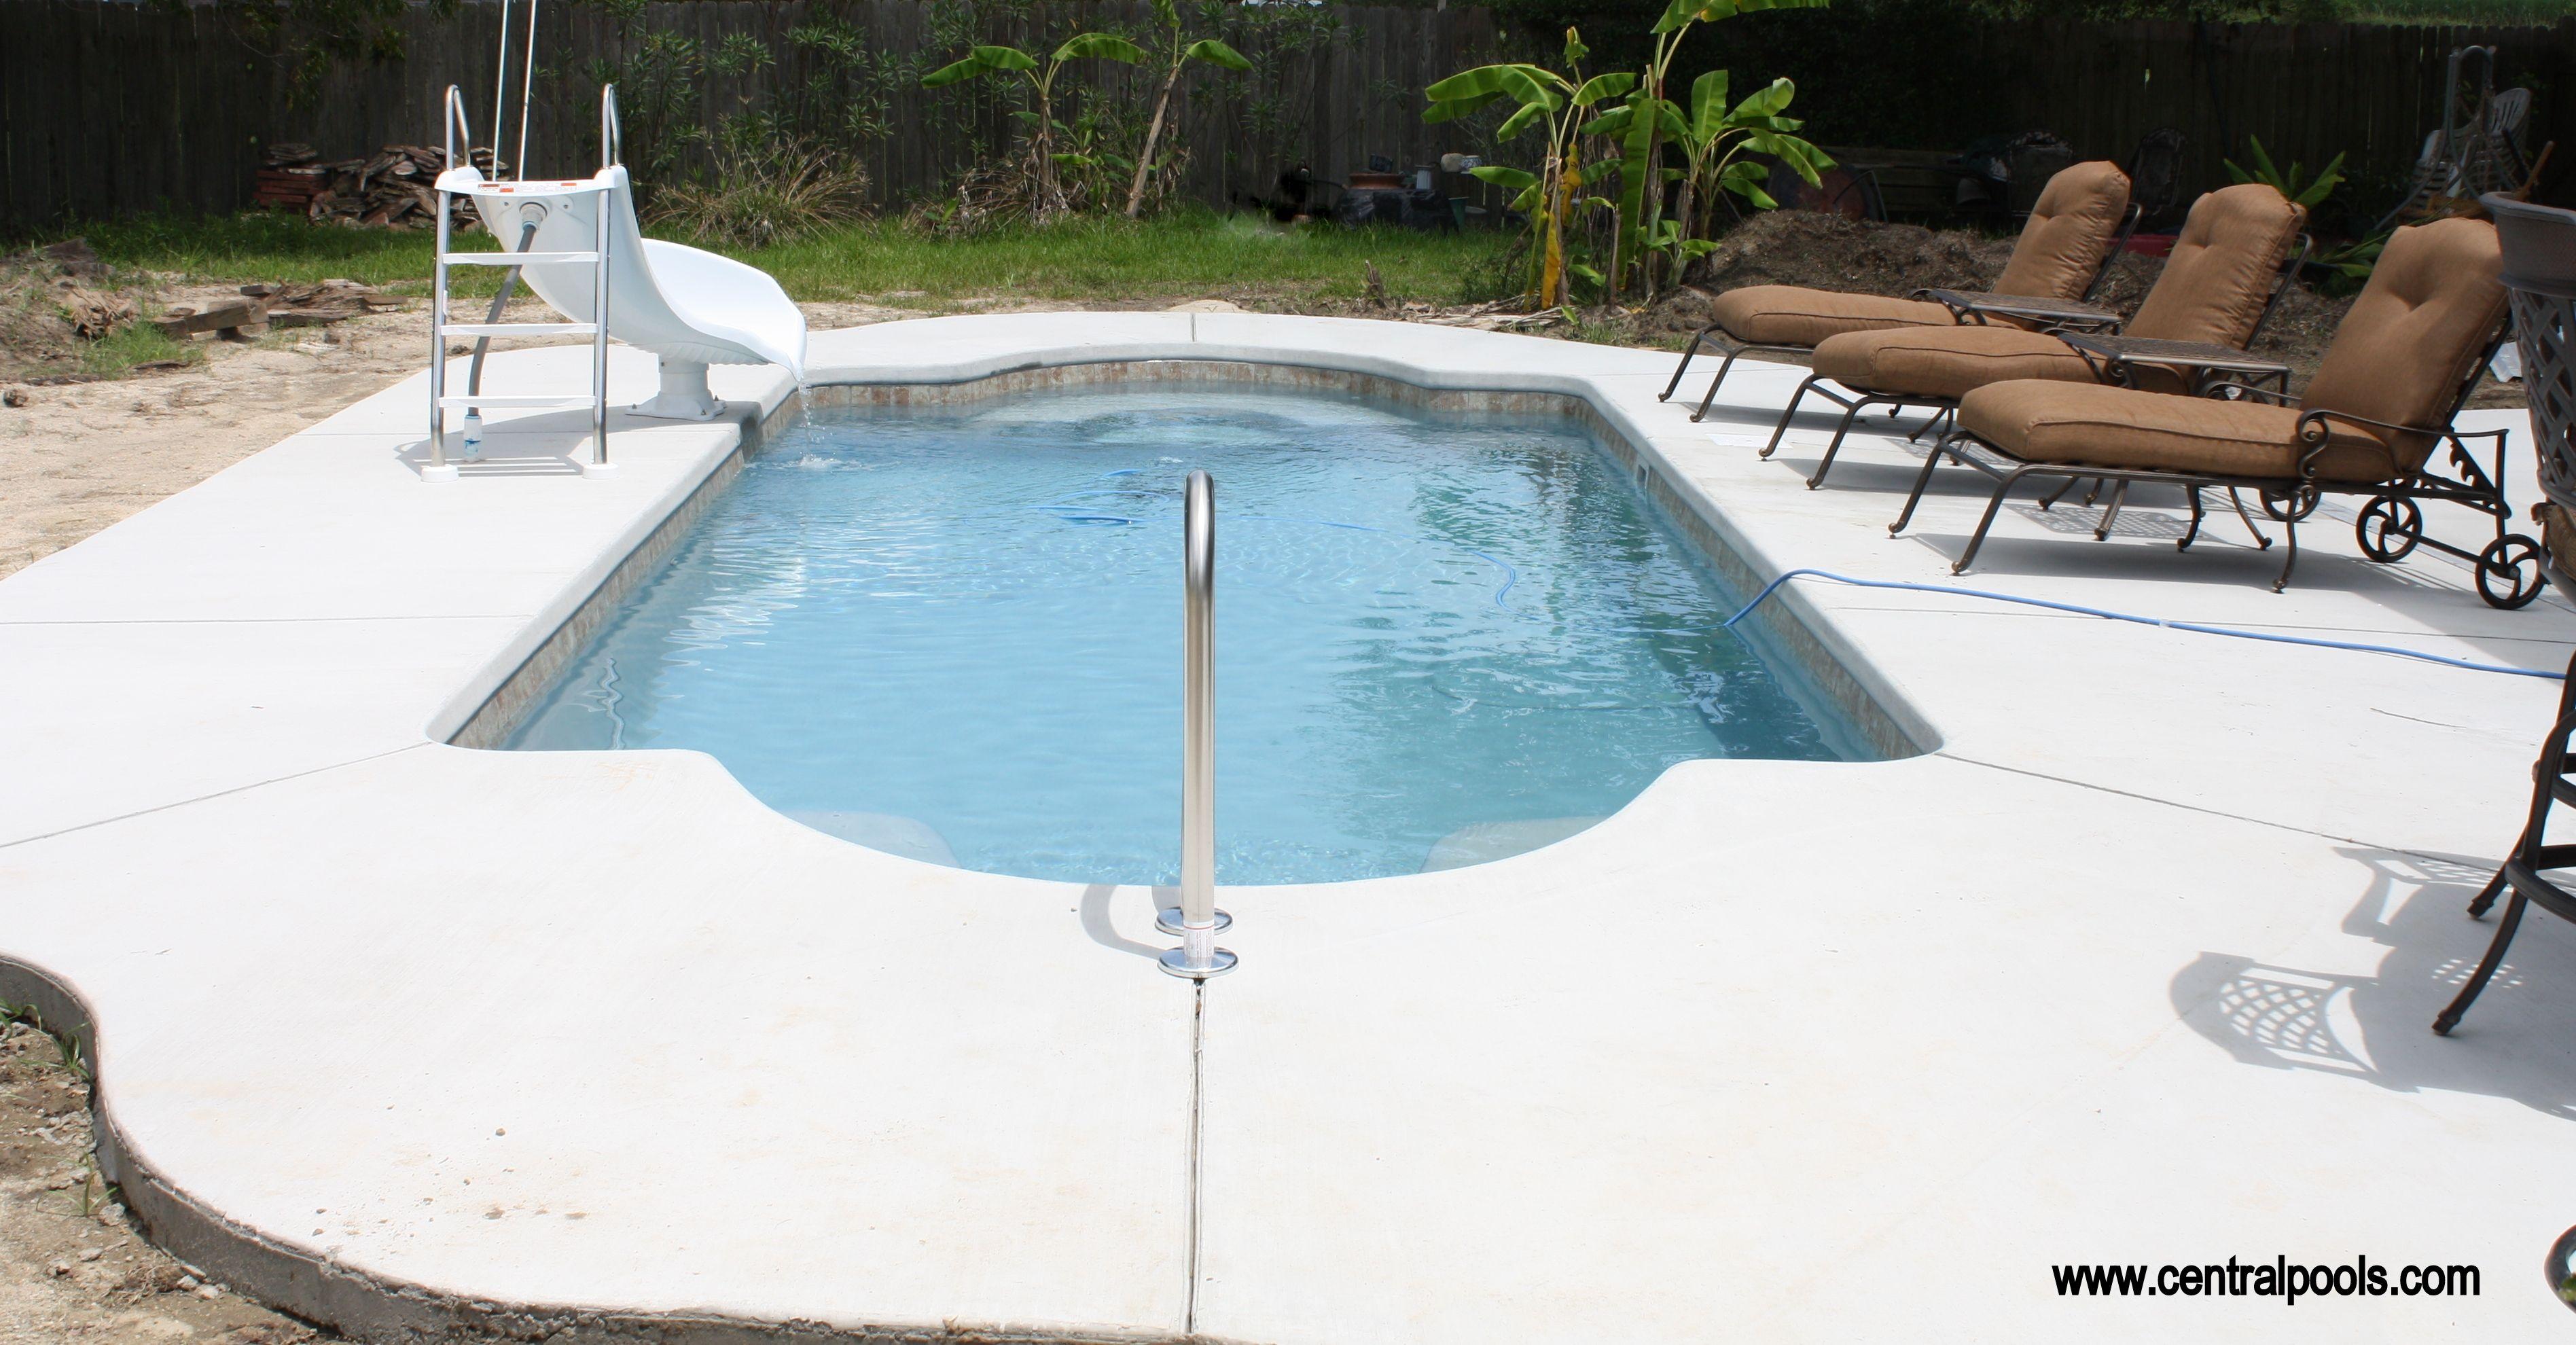 Fiberglass Swimming Pool Fiberglass Pools Pool Swimming Pools